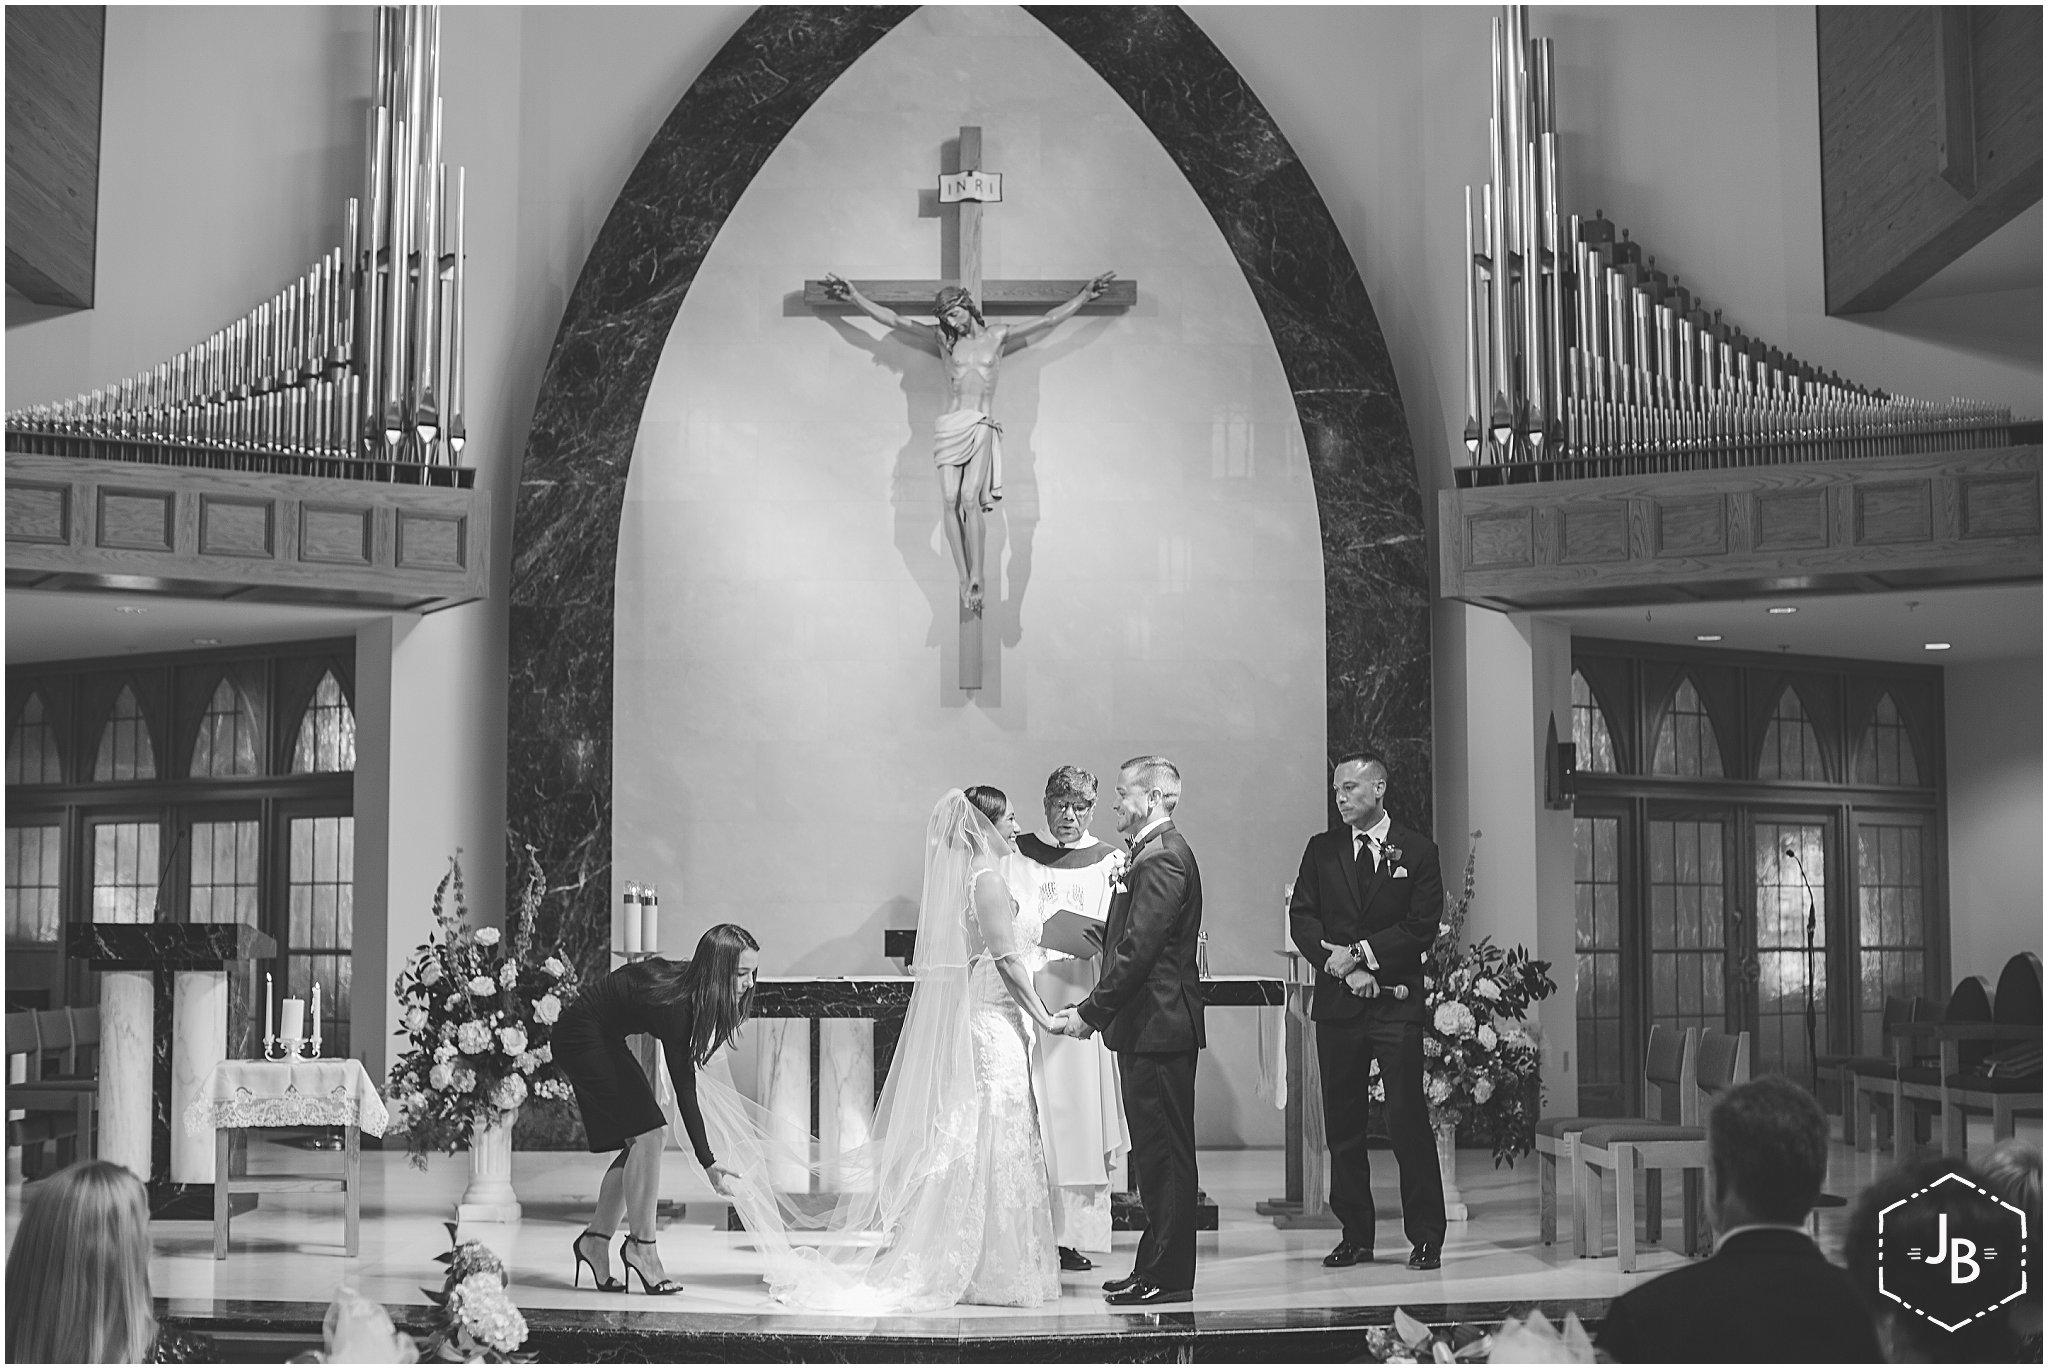 WeddingandEngagementFloridaPhotographer_0207.jpg